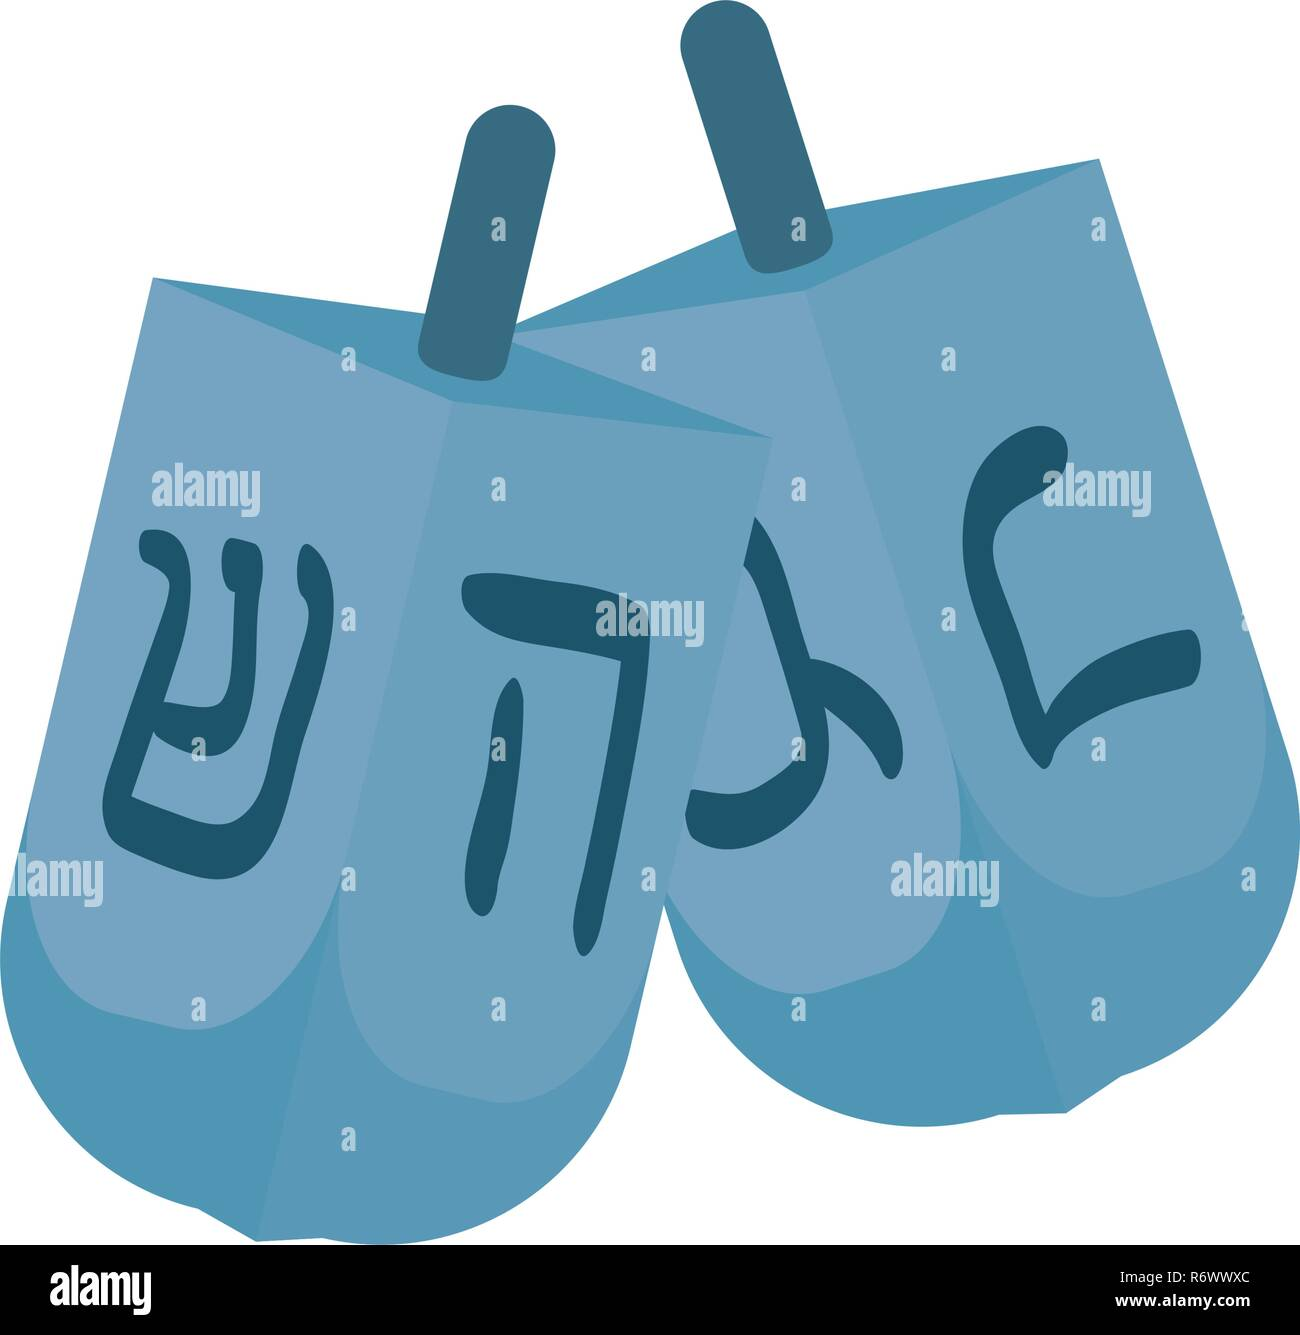 Jewish dreidel hanukkah icon vector illustration design - Stock Image